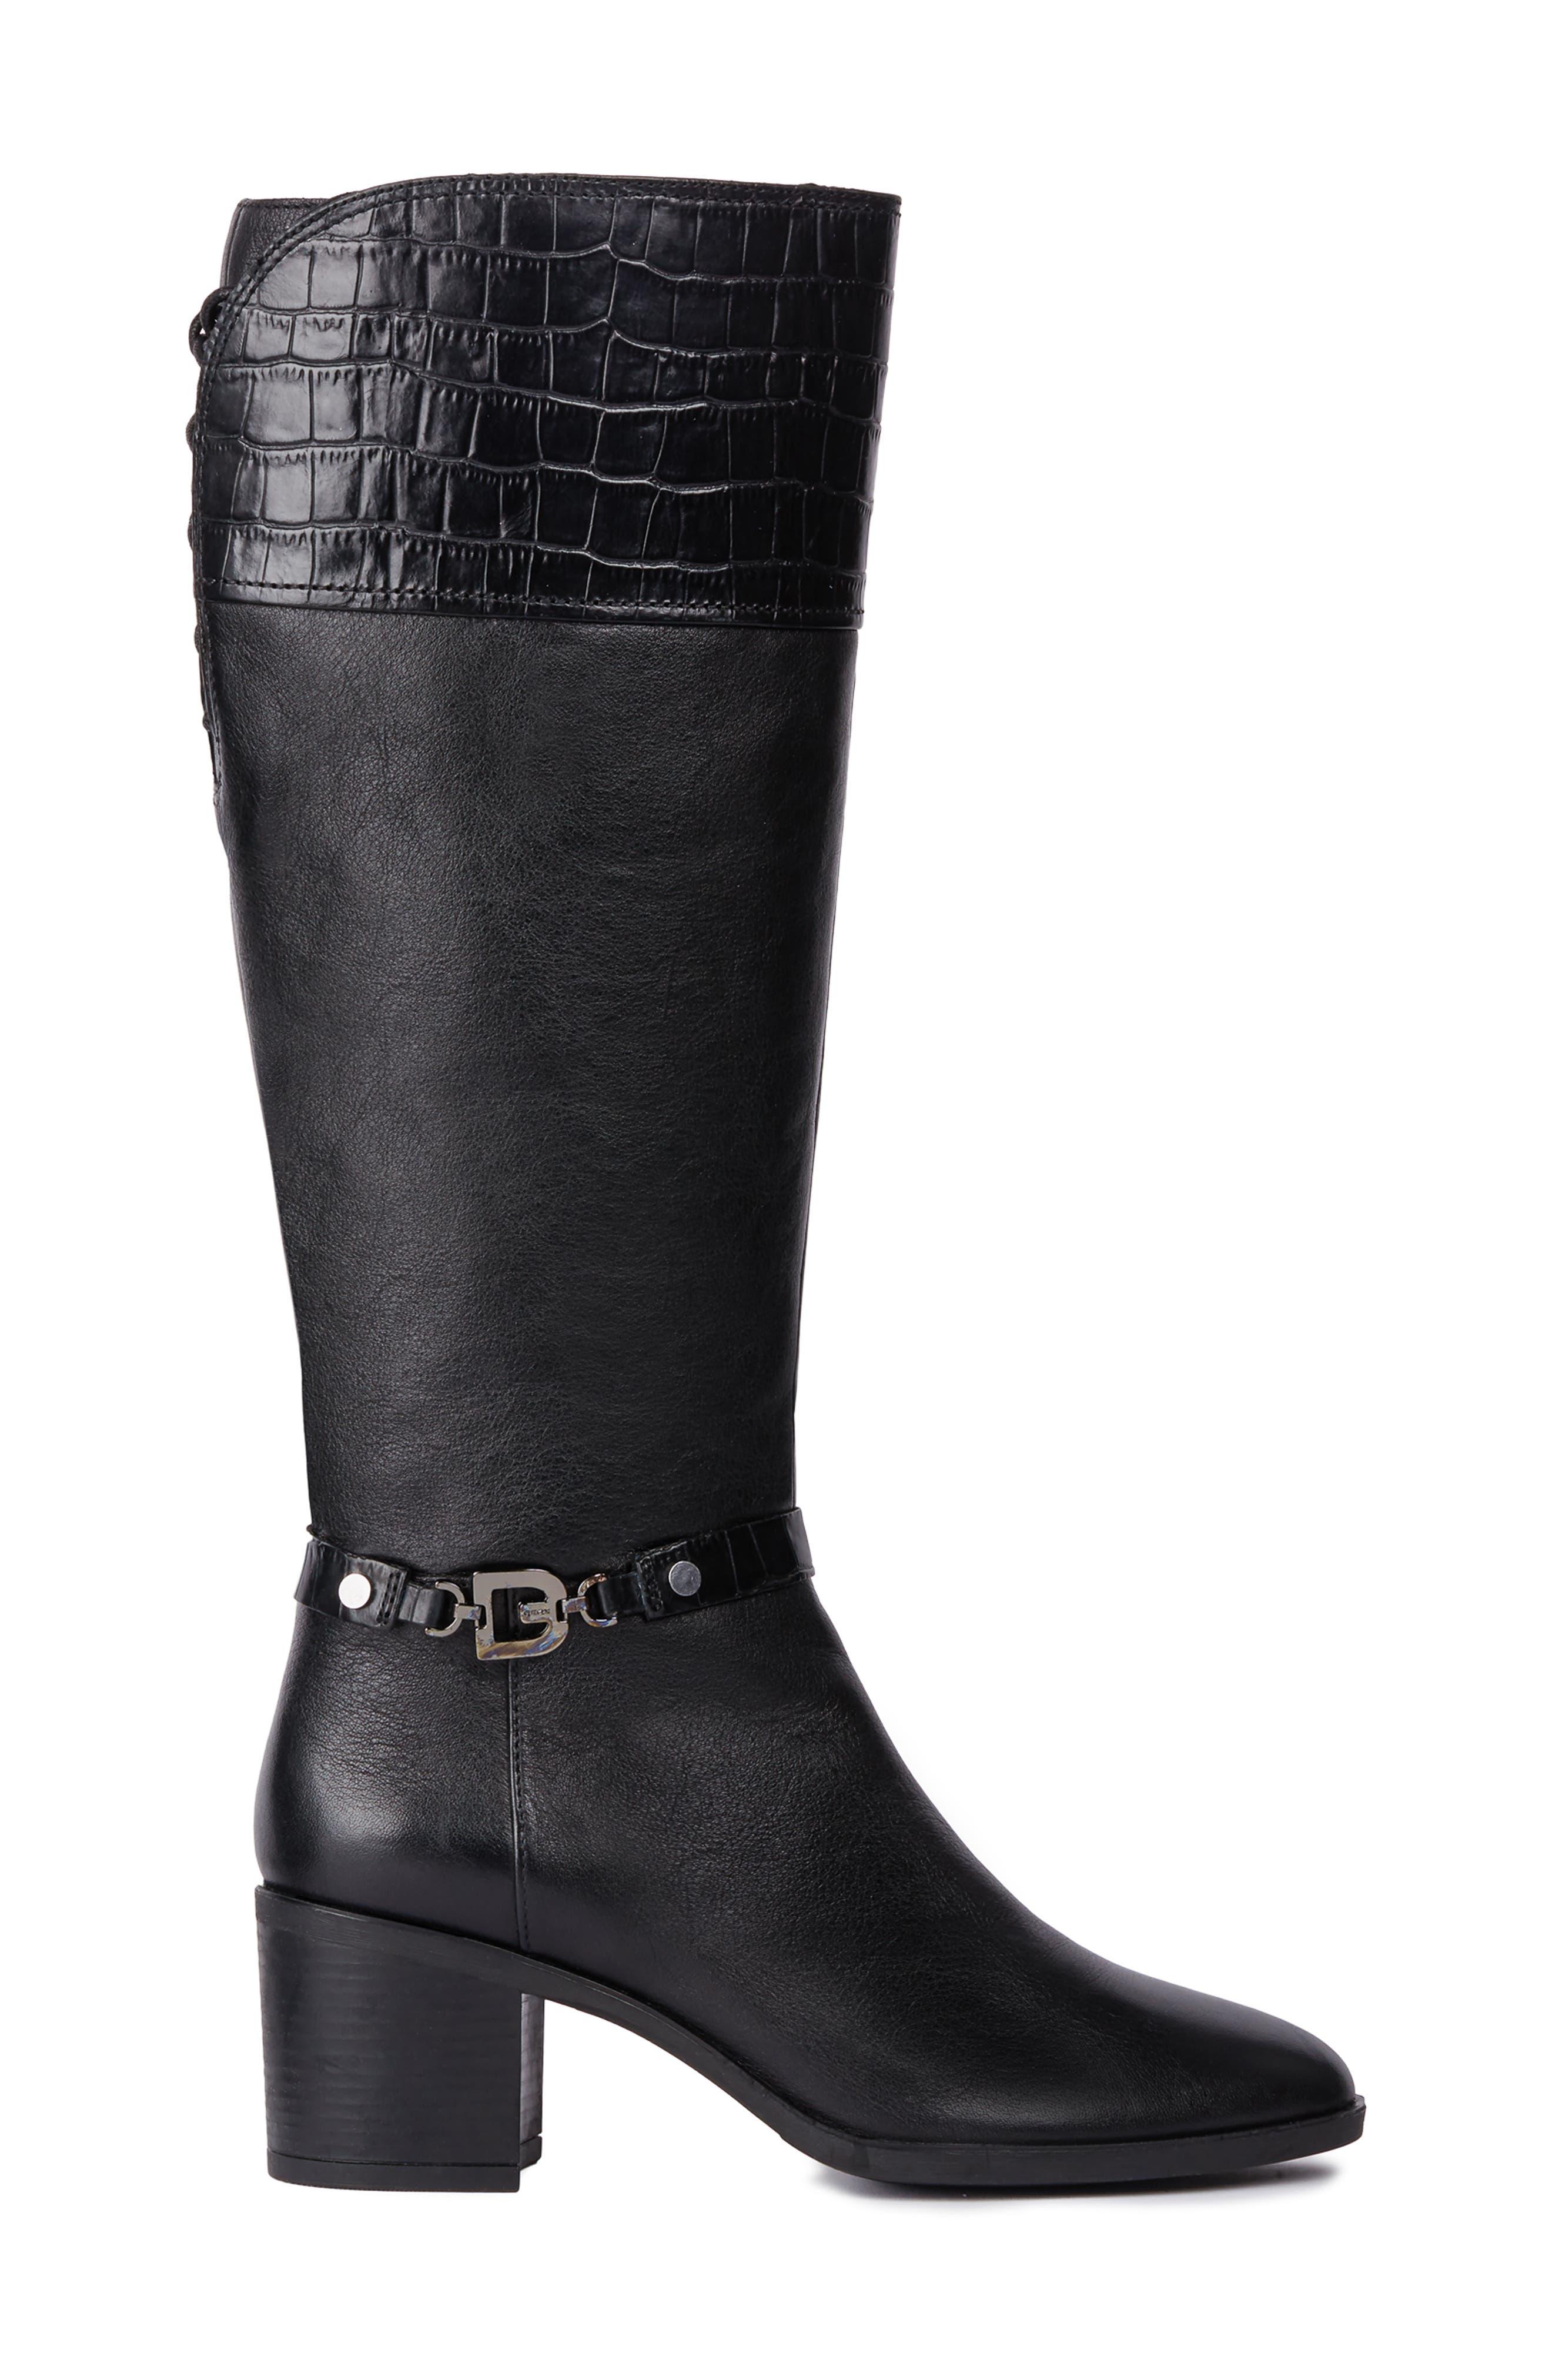 Glynna Knee High Boot,                             Alternate thumbnail 3, color,                             BLACK/ BLACK LEATHER